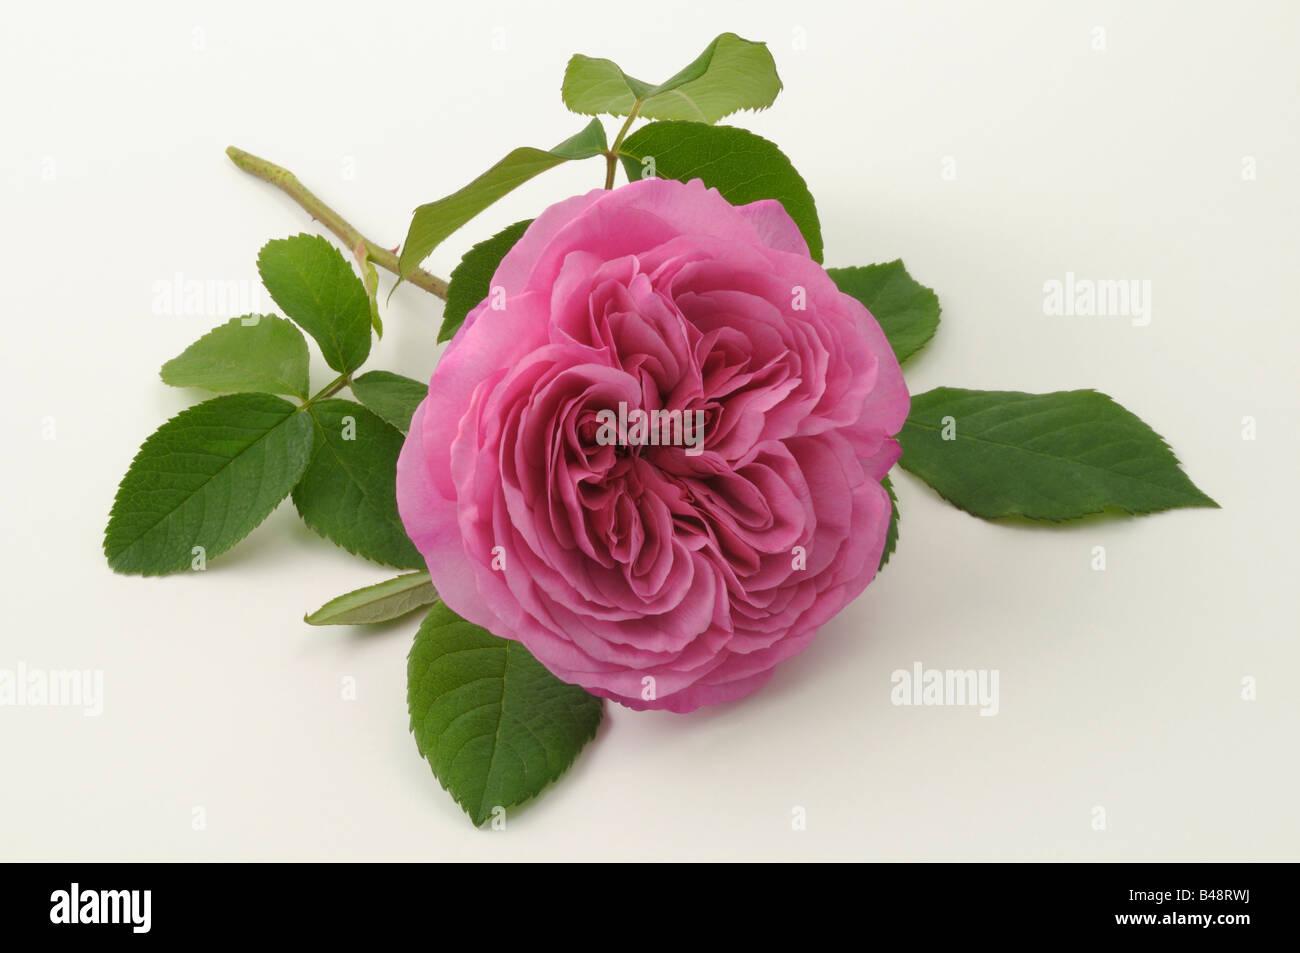 Damask Rose (Rosa x damascena), variété: Ispahan, fleur, studio photo Photo Stock